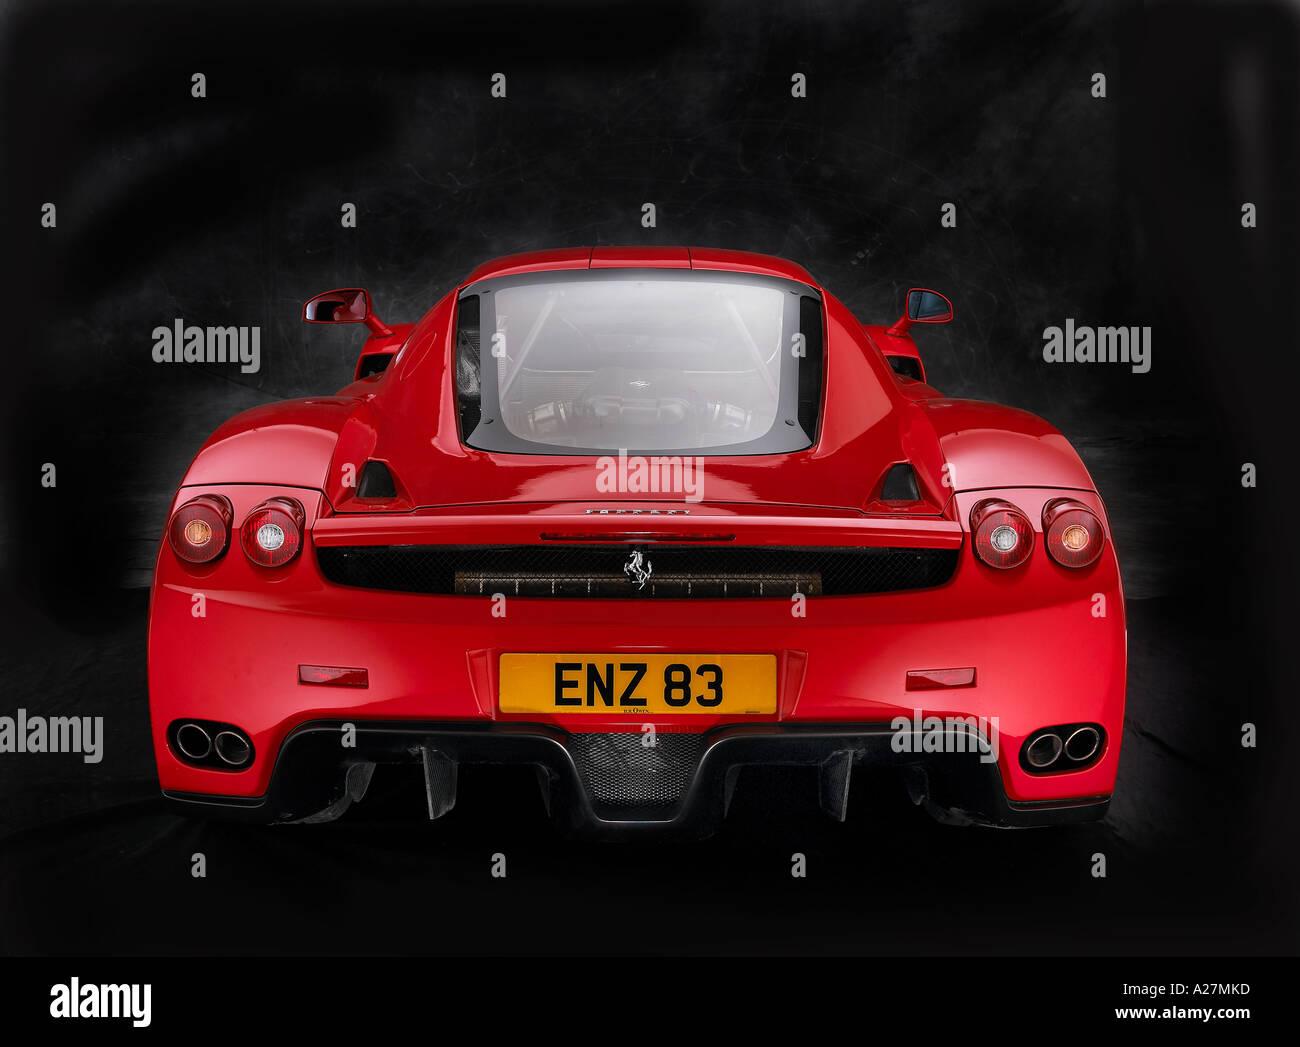 2004 Ferrari Enzo - Stock Image